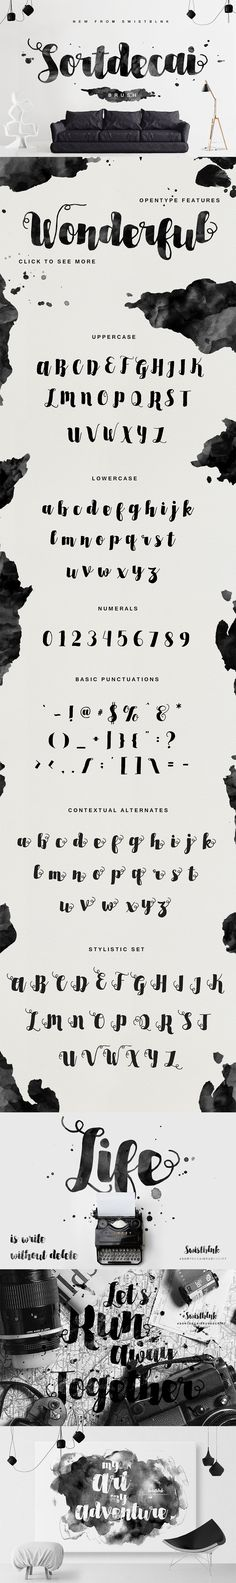 The Freakishly Huge Bundle of 40 Fonts and Bonus Vectors (Plus Web Fonts & Extended Licensing) - Only $39   MyDesignDeals